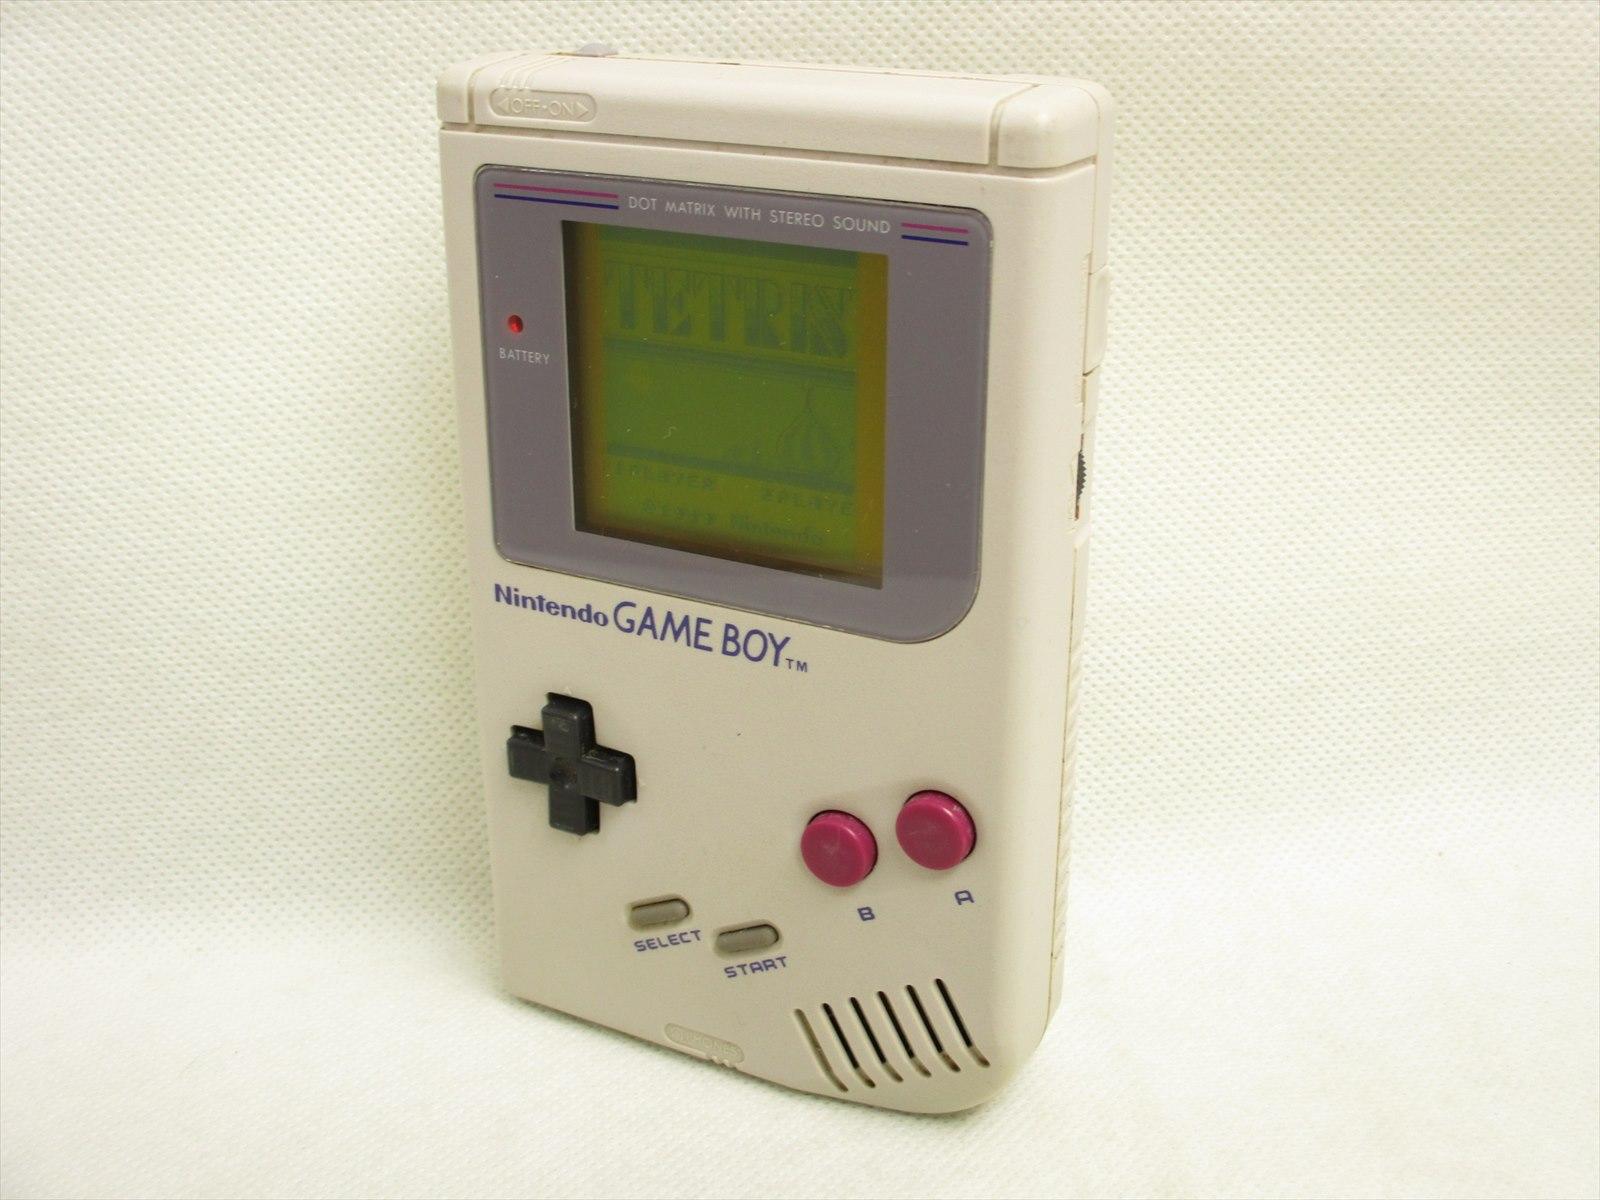 Nintendo Game Boy Original Console System Gameboy DMG 01 Classic Japan 16102 GB 050400103368   eBay